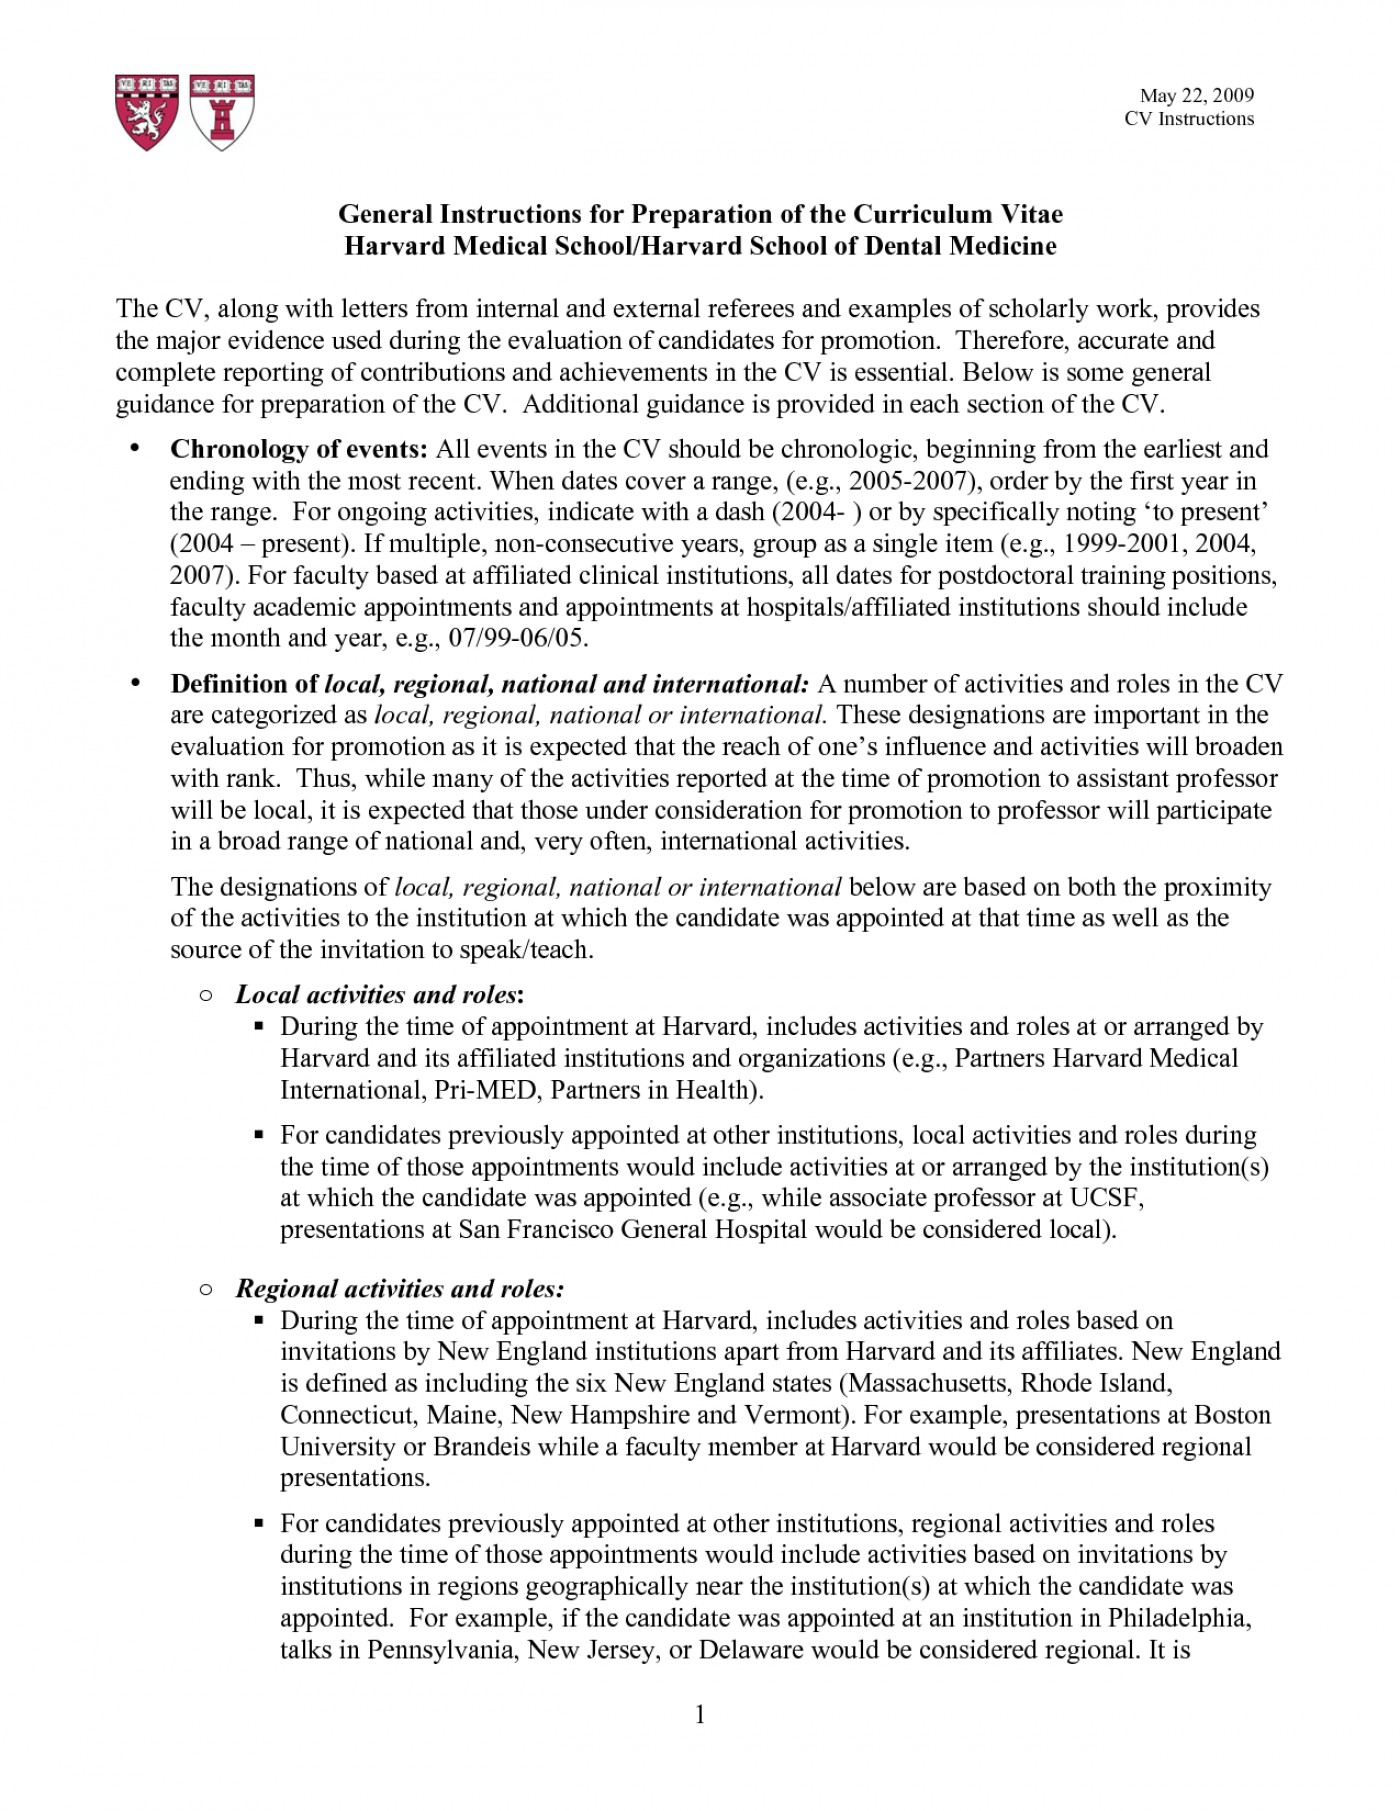 Thesis free download pdf malaysia ump